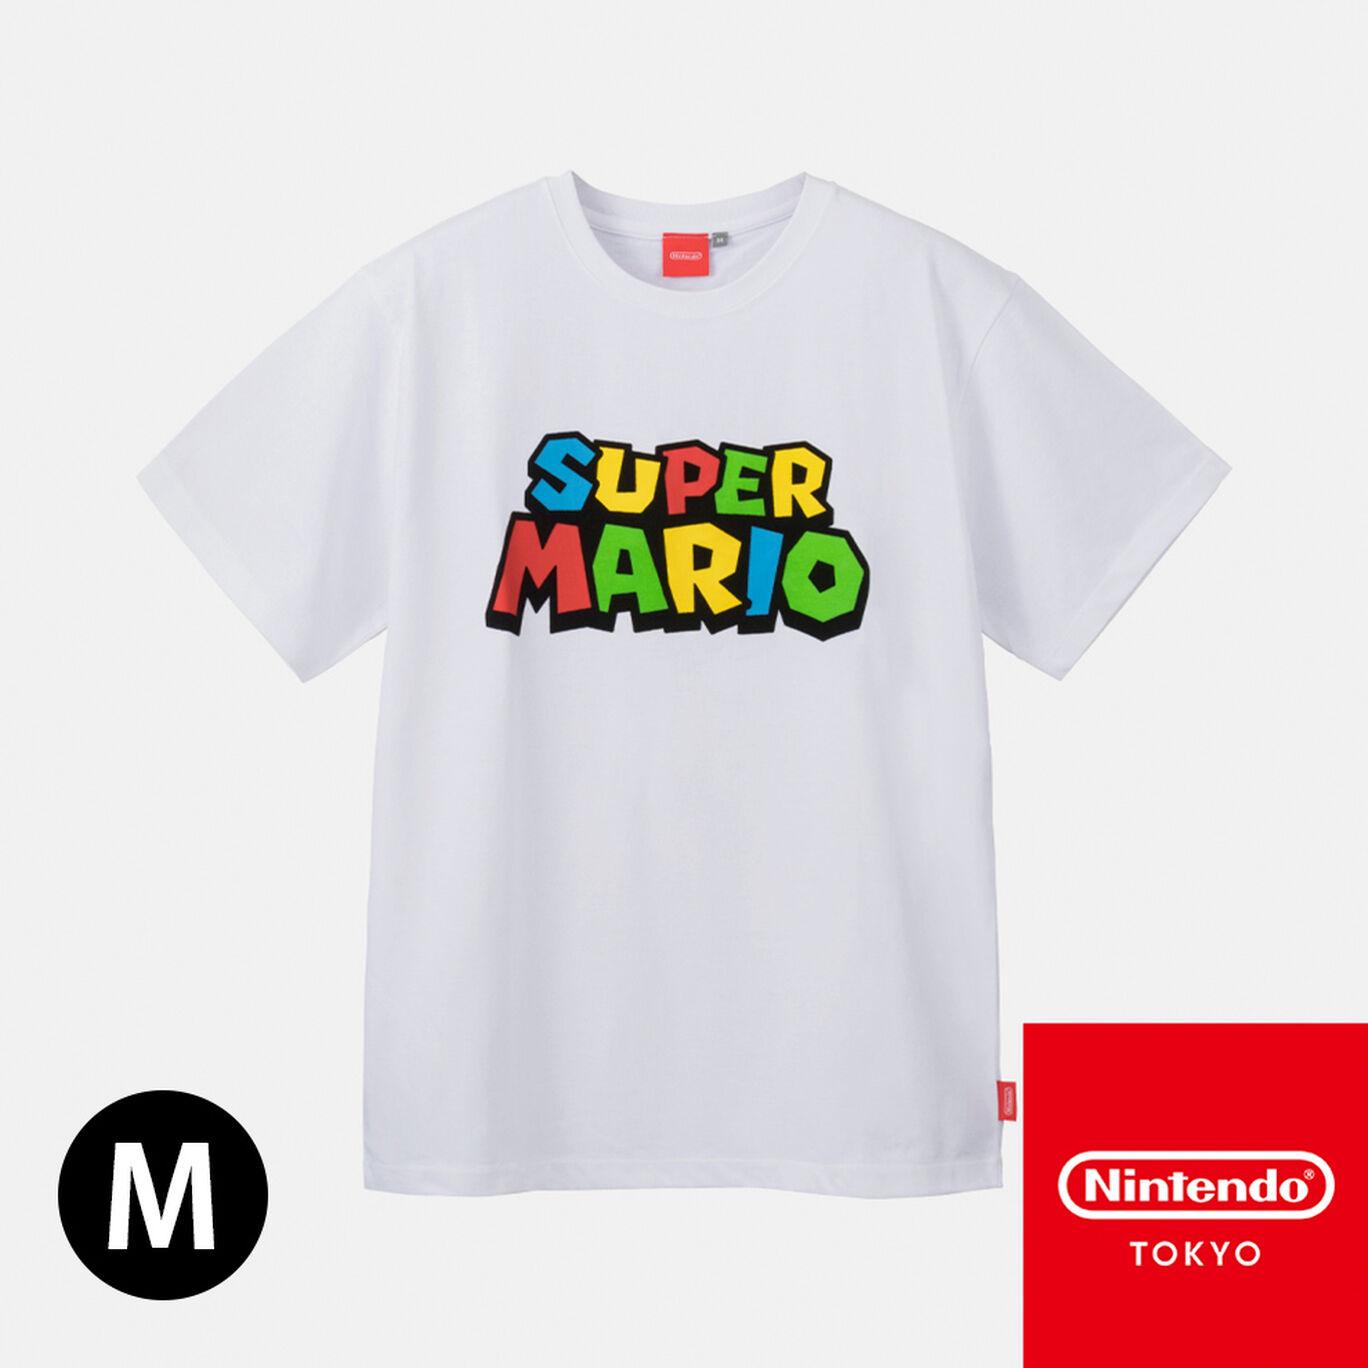 Tシャツ スーパーマリオ C M【Nintendo TOKYO取り扱い商品】